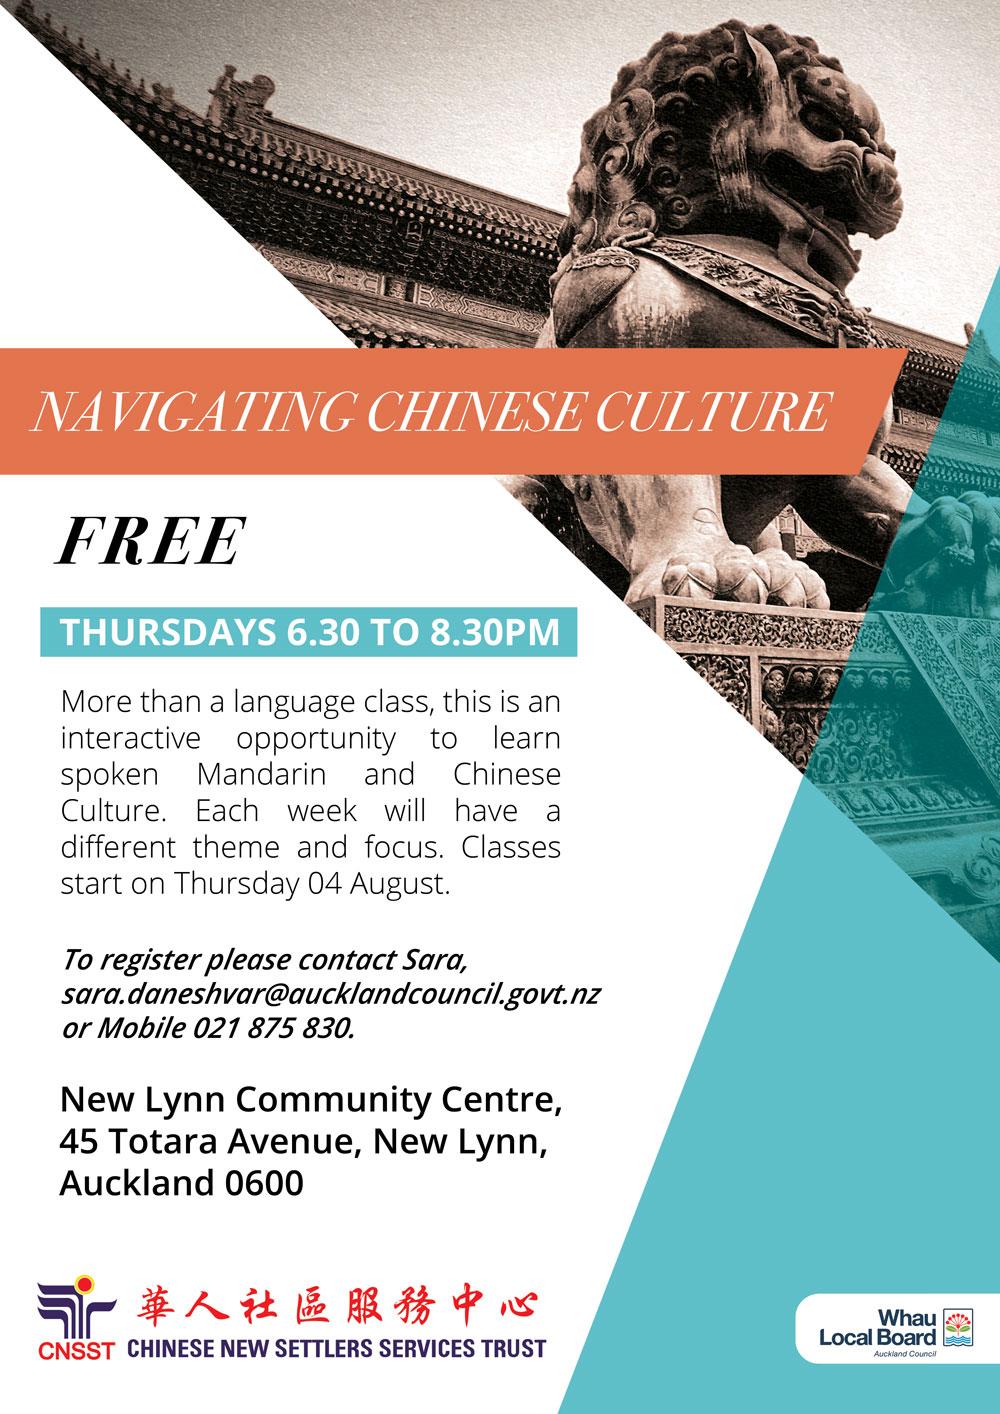 Navigating-Chinese-Culture.jpg